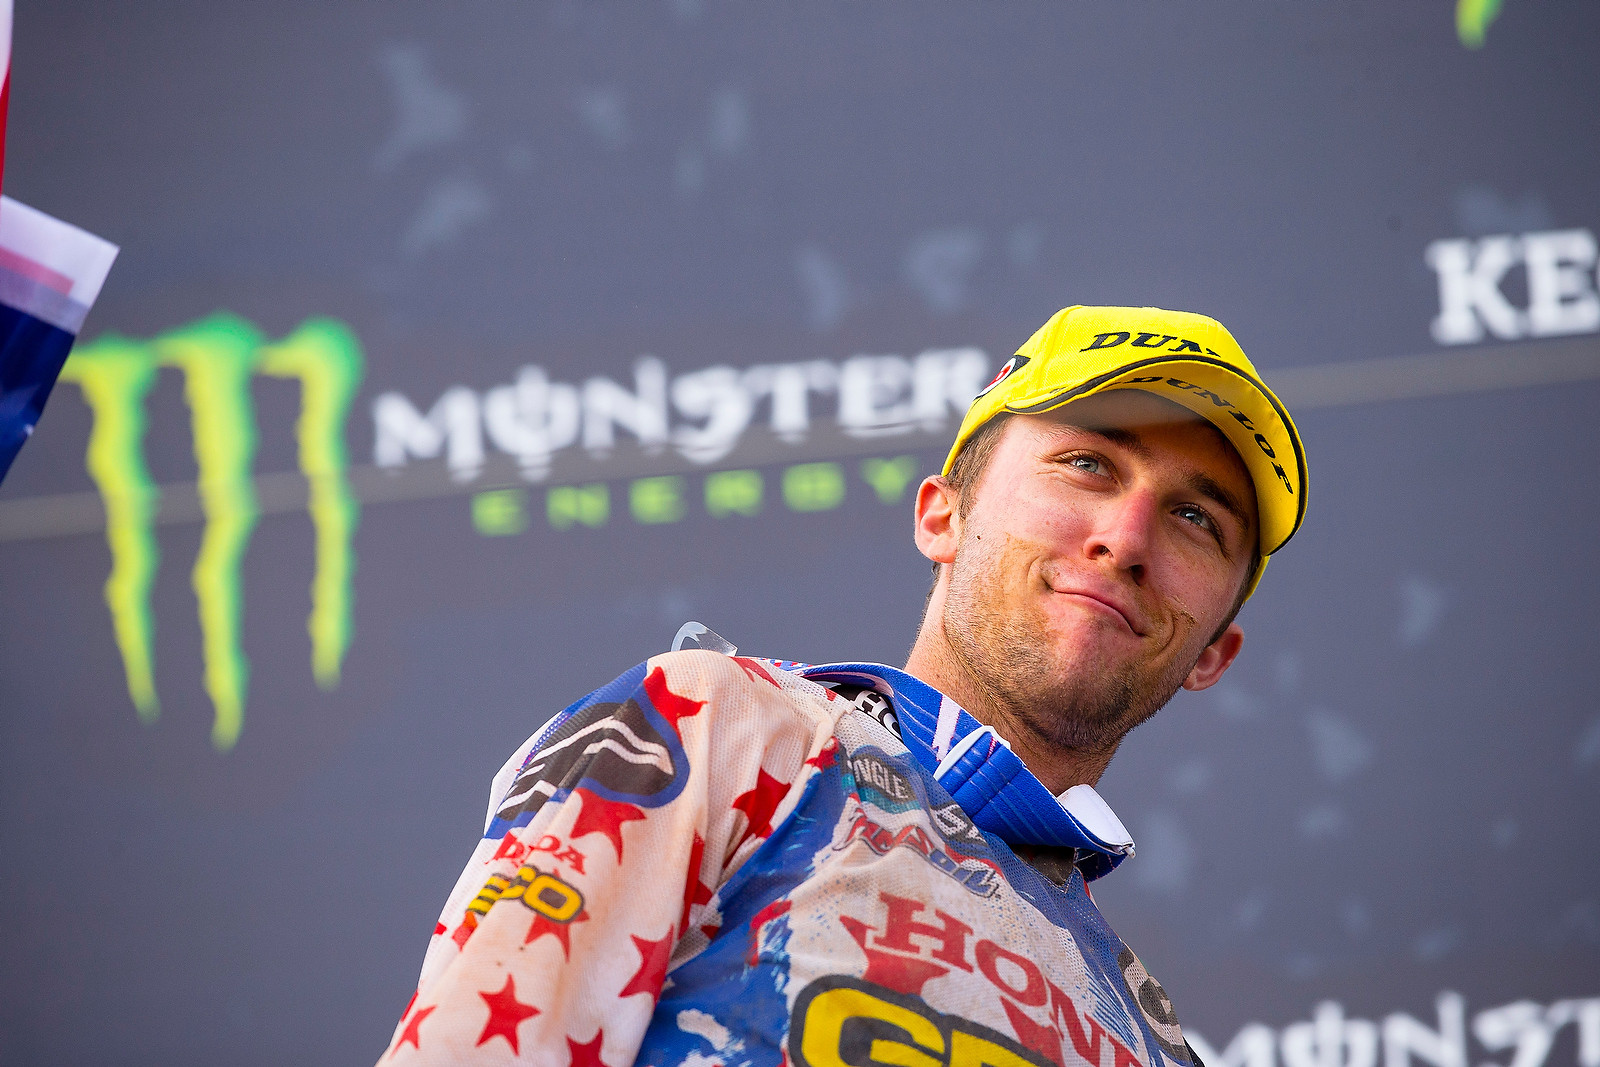 Eli Tomac - kardy - Motocross Pictures - Vital MX